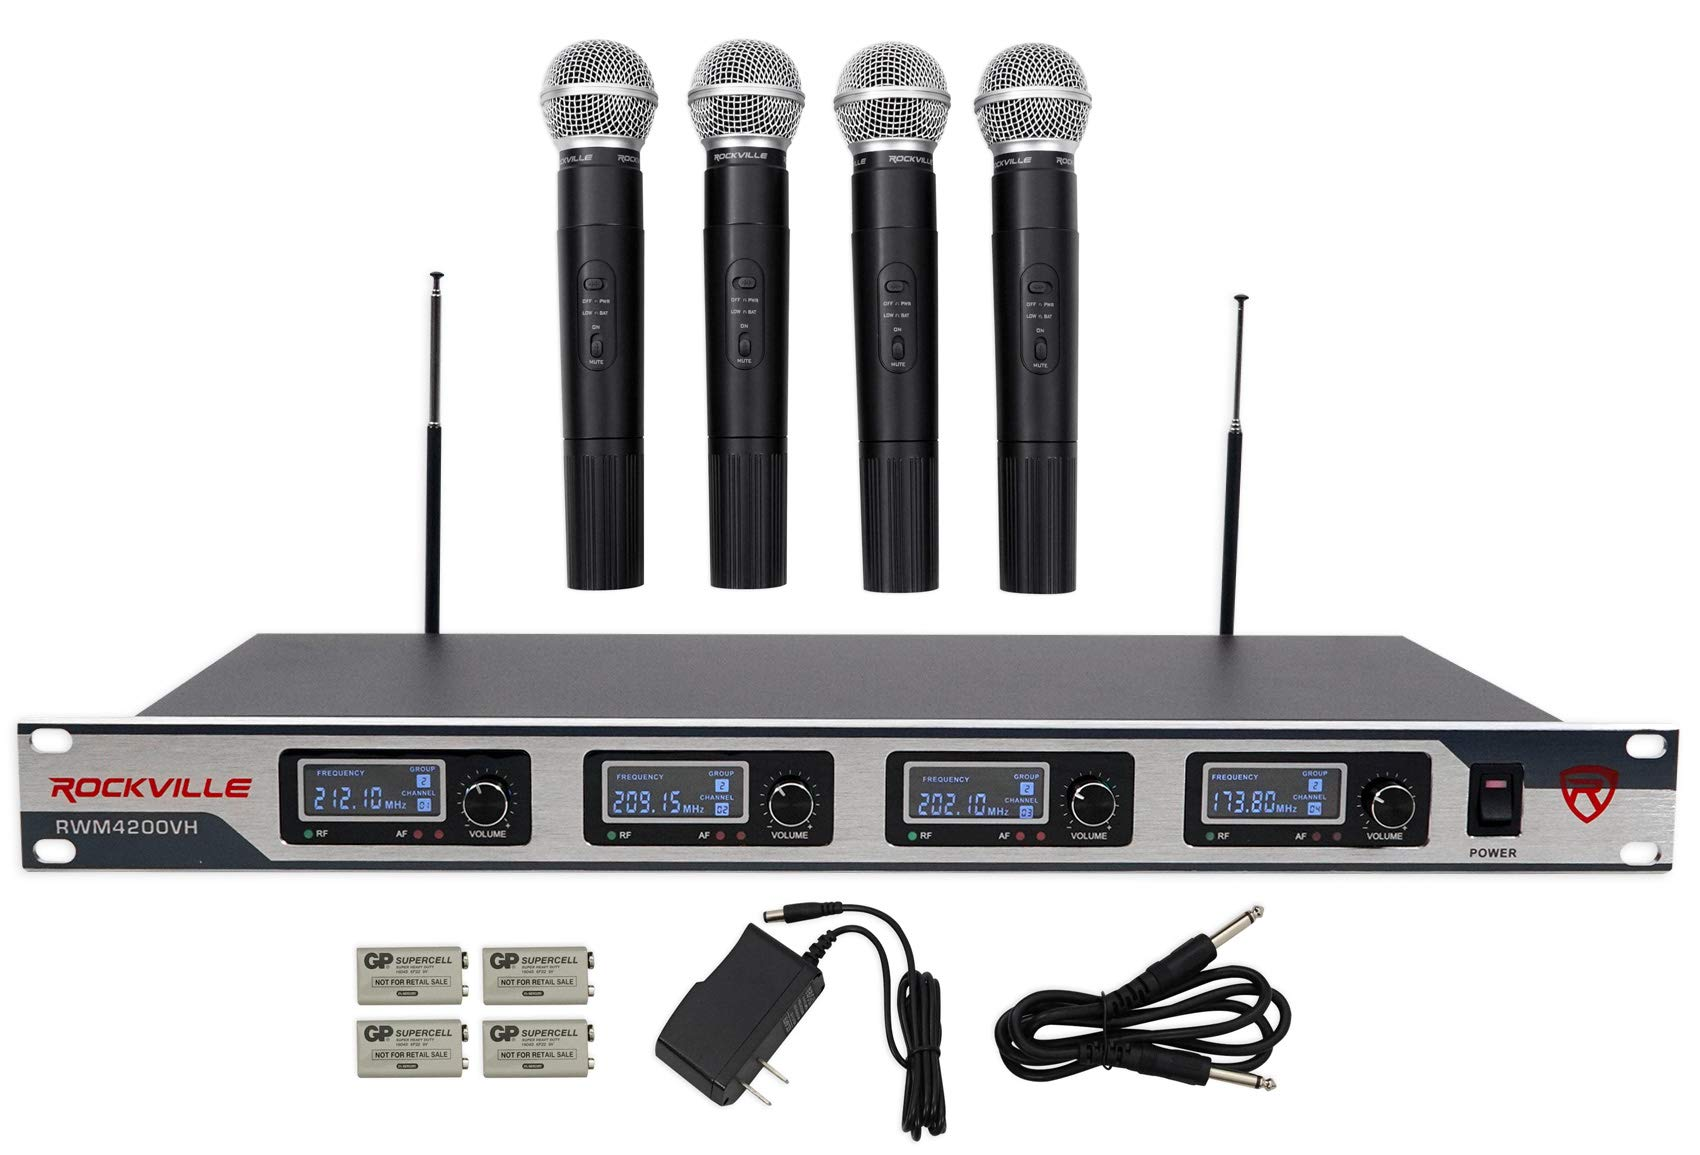 Rockville RWM4200VH VHF (4) Wireless HandHeld Microphones 4 Church Sound Systems